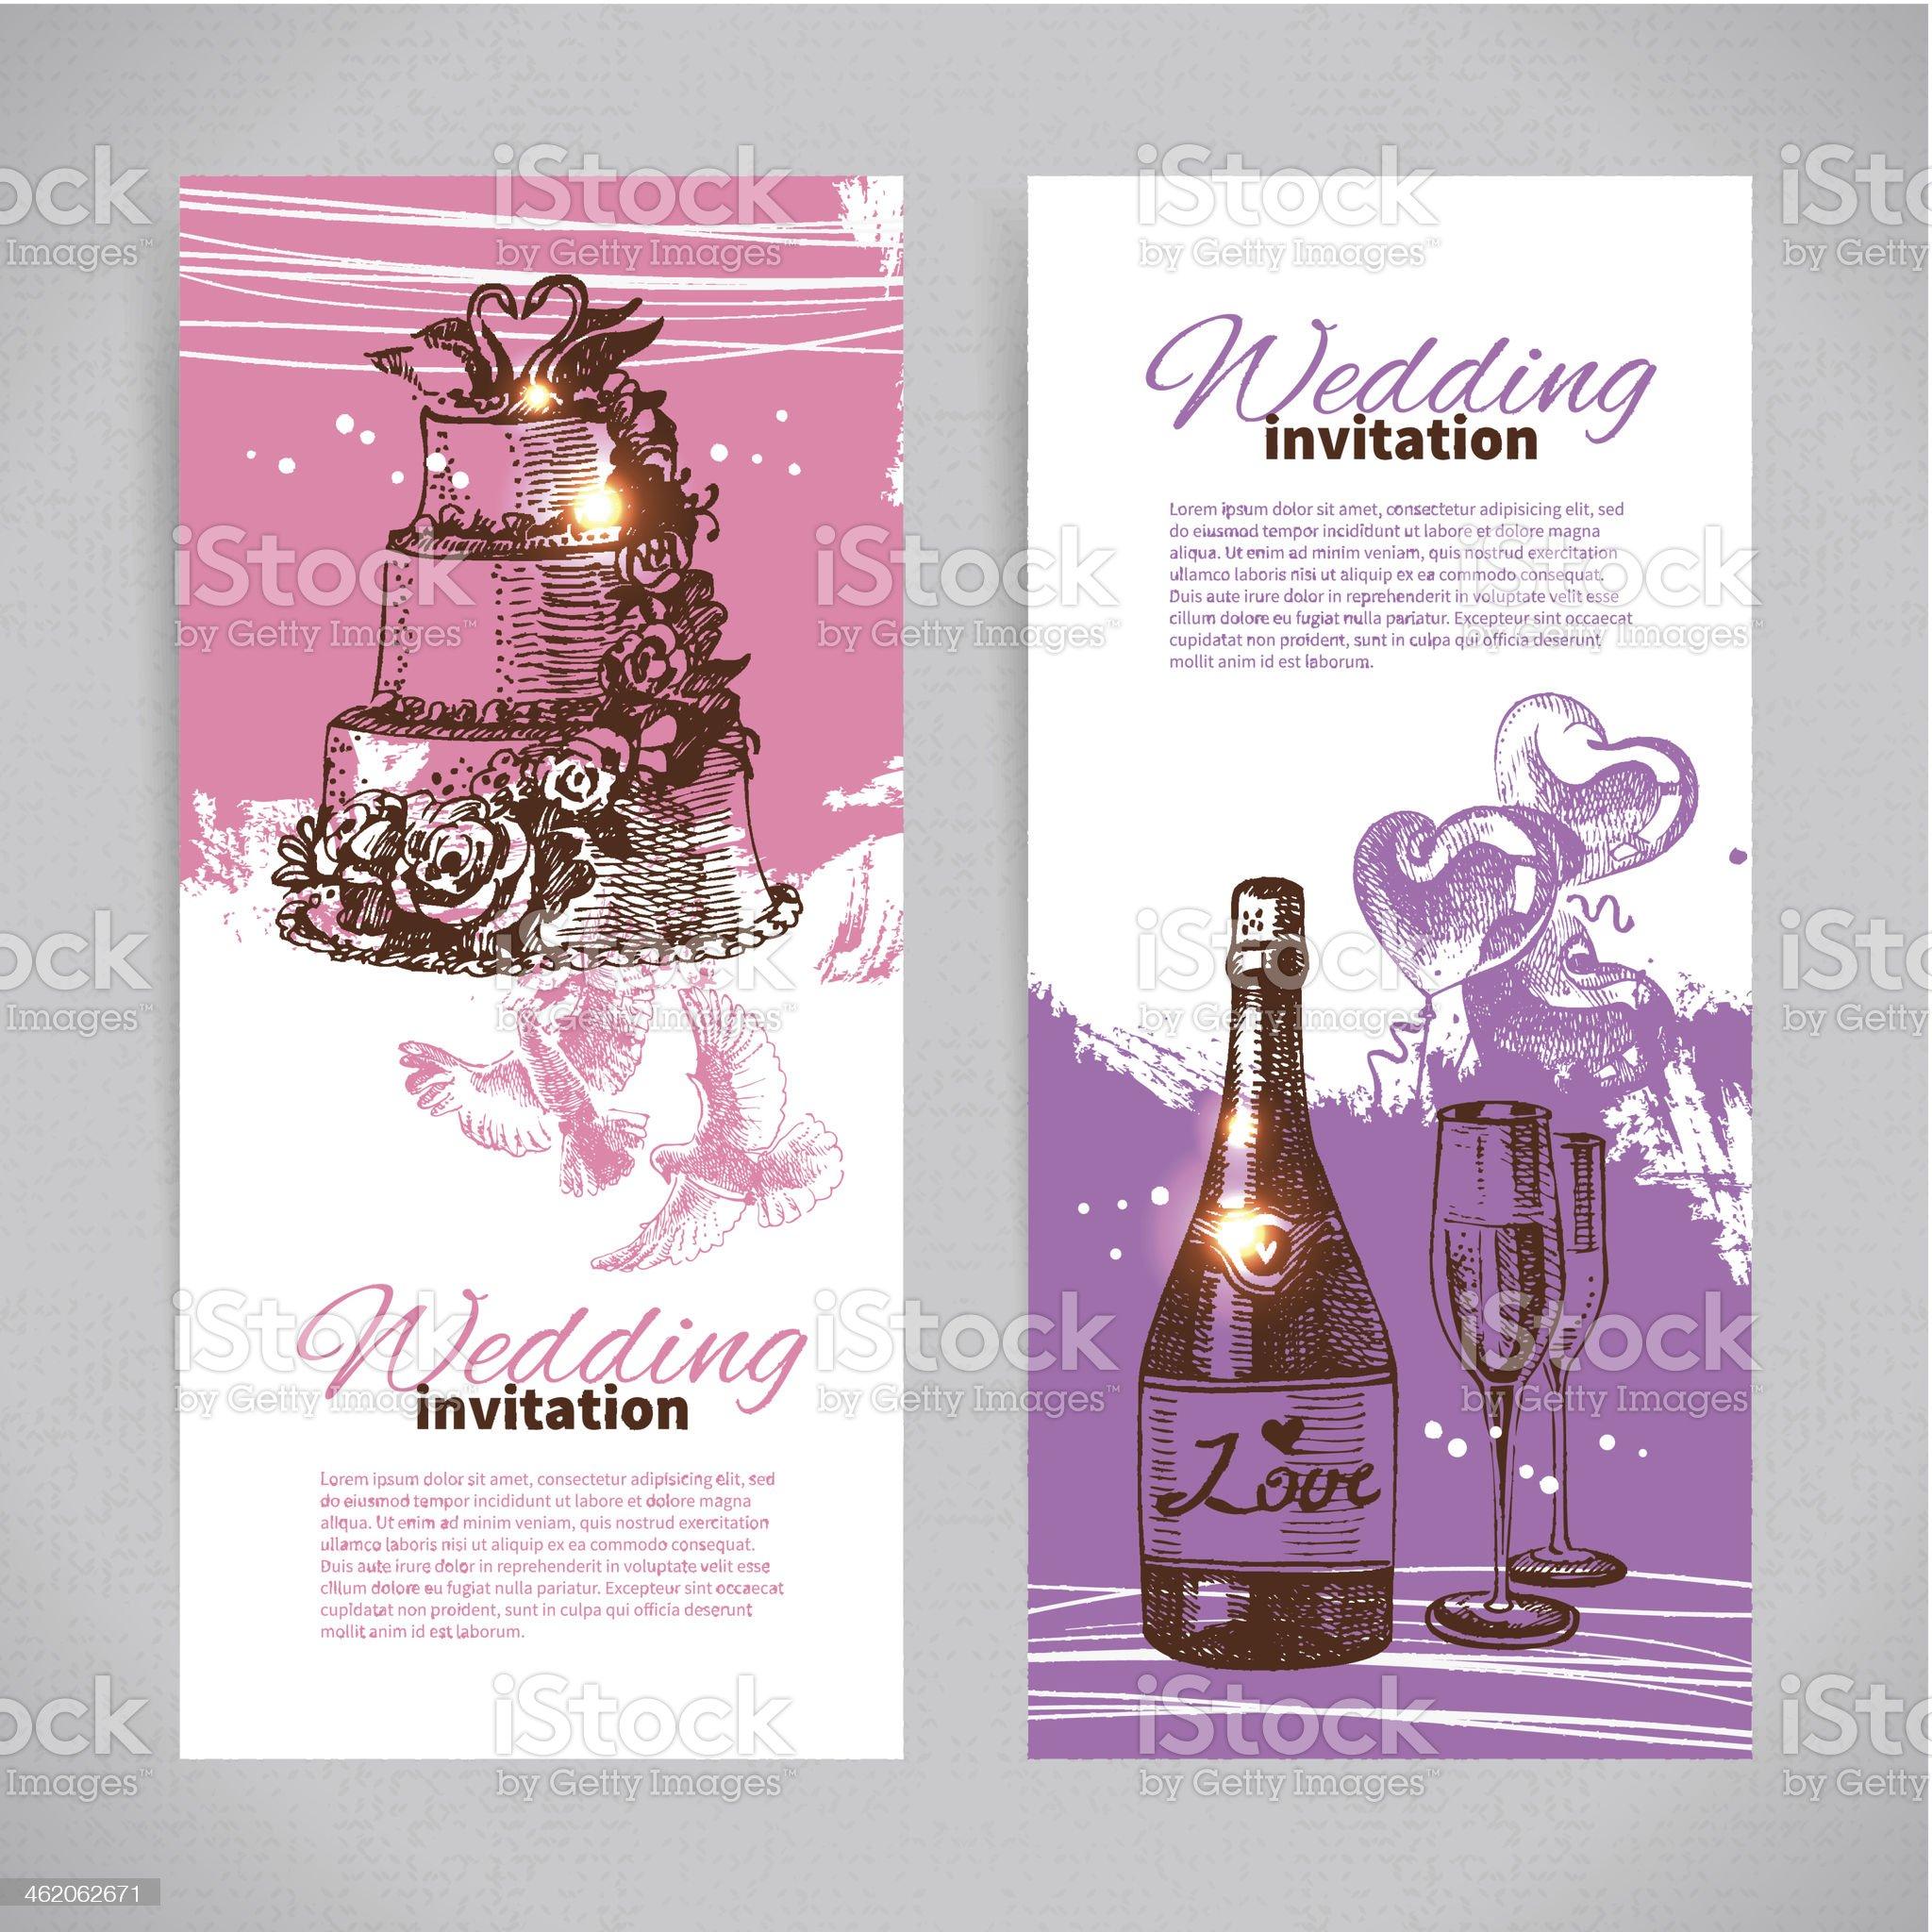 Wedding invitations royalty-free stock vector art